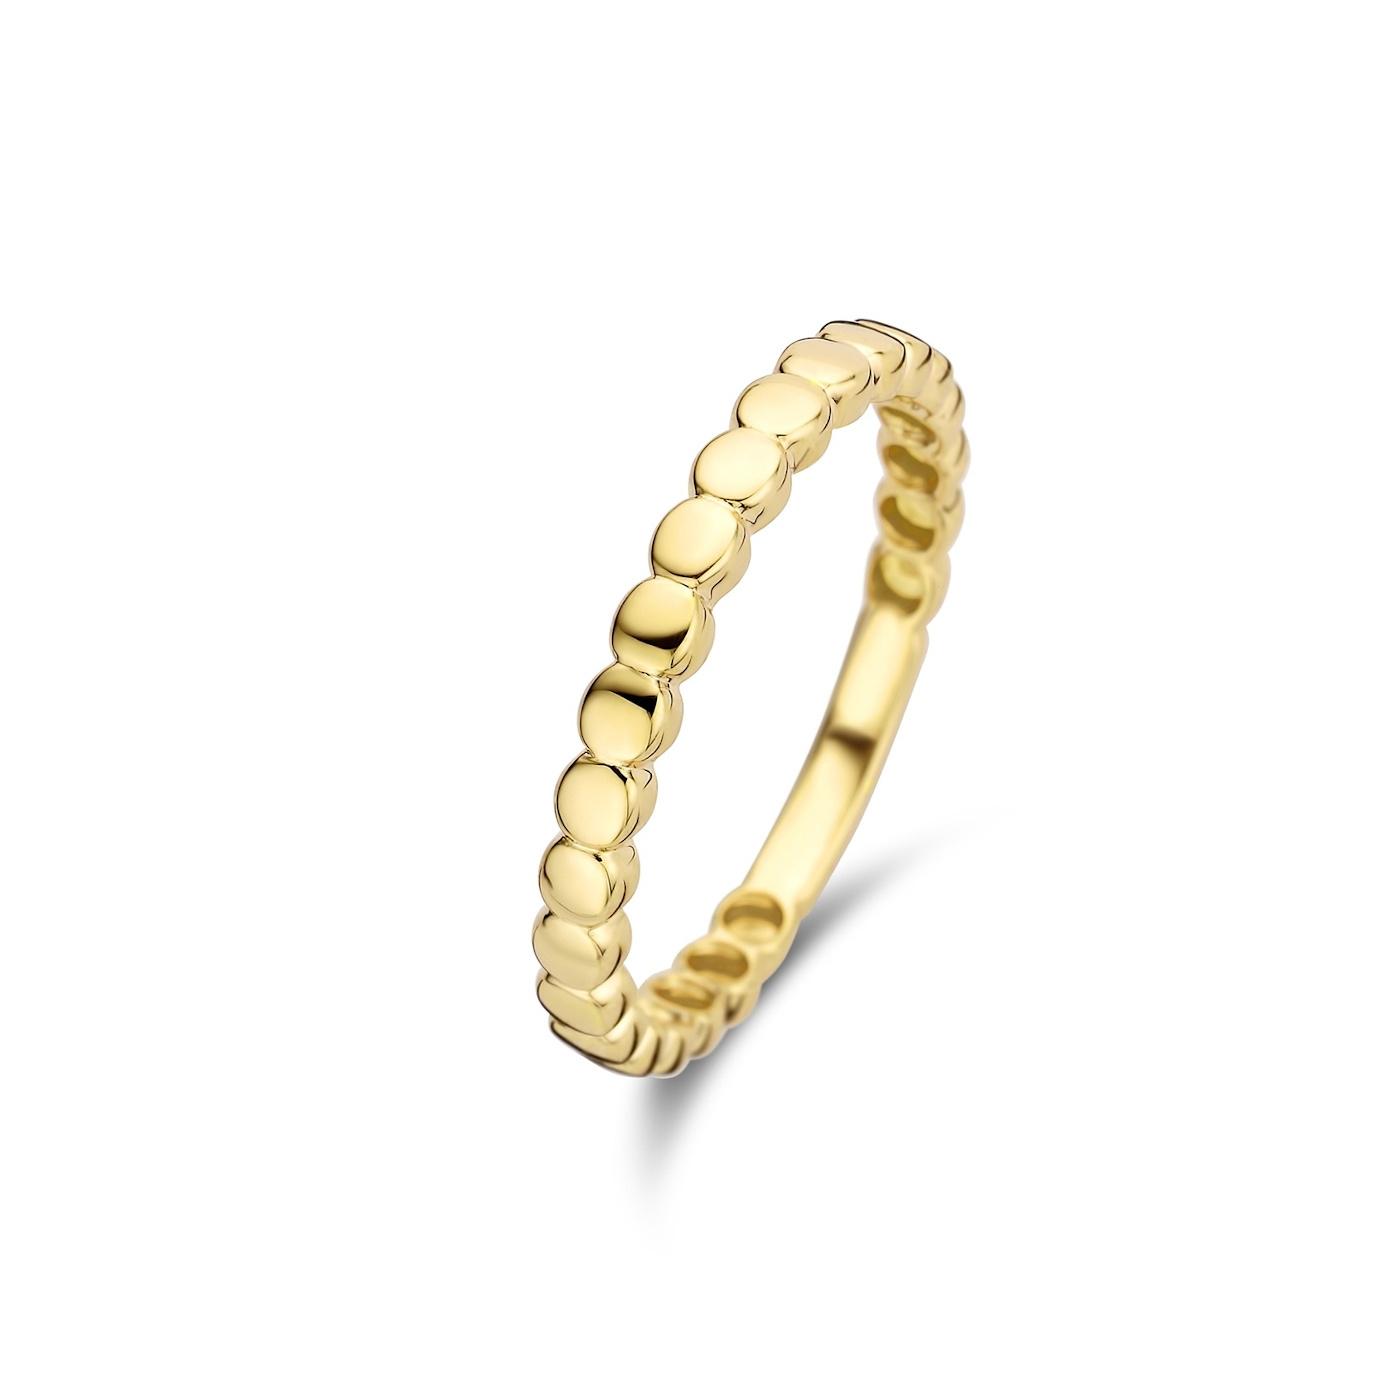 Isabel Bernard Le Marais Zélie anello in oro 14 carati